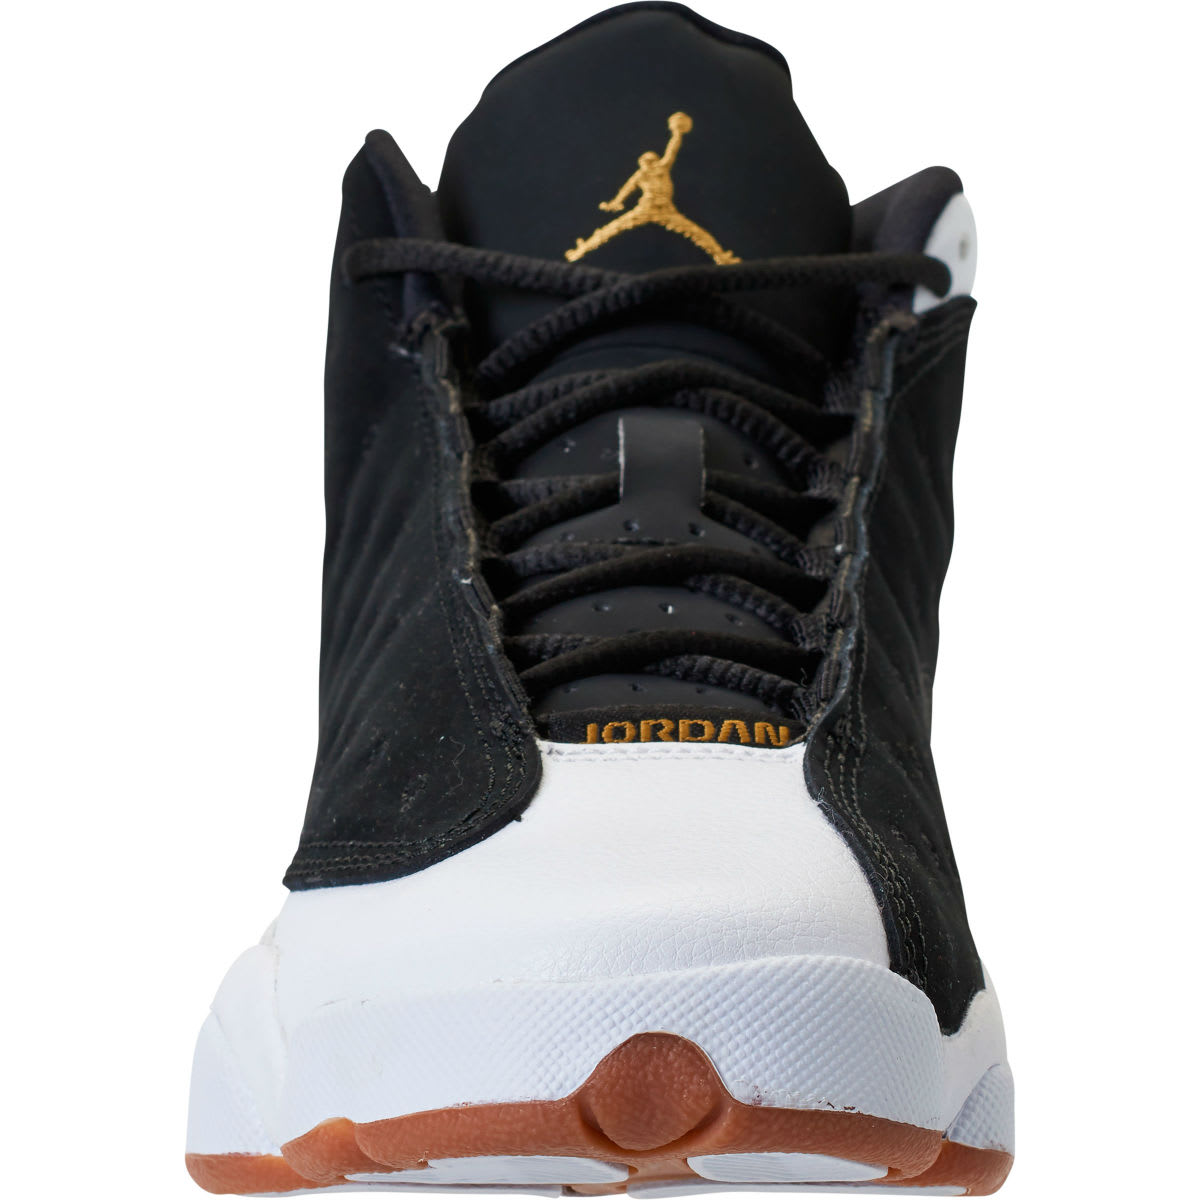 b1bc717acaa0c ... Air Jordan 13 Girls Black Gold White Gum Release Date 439358-021 Sole  Collector ...